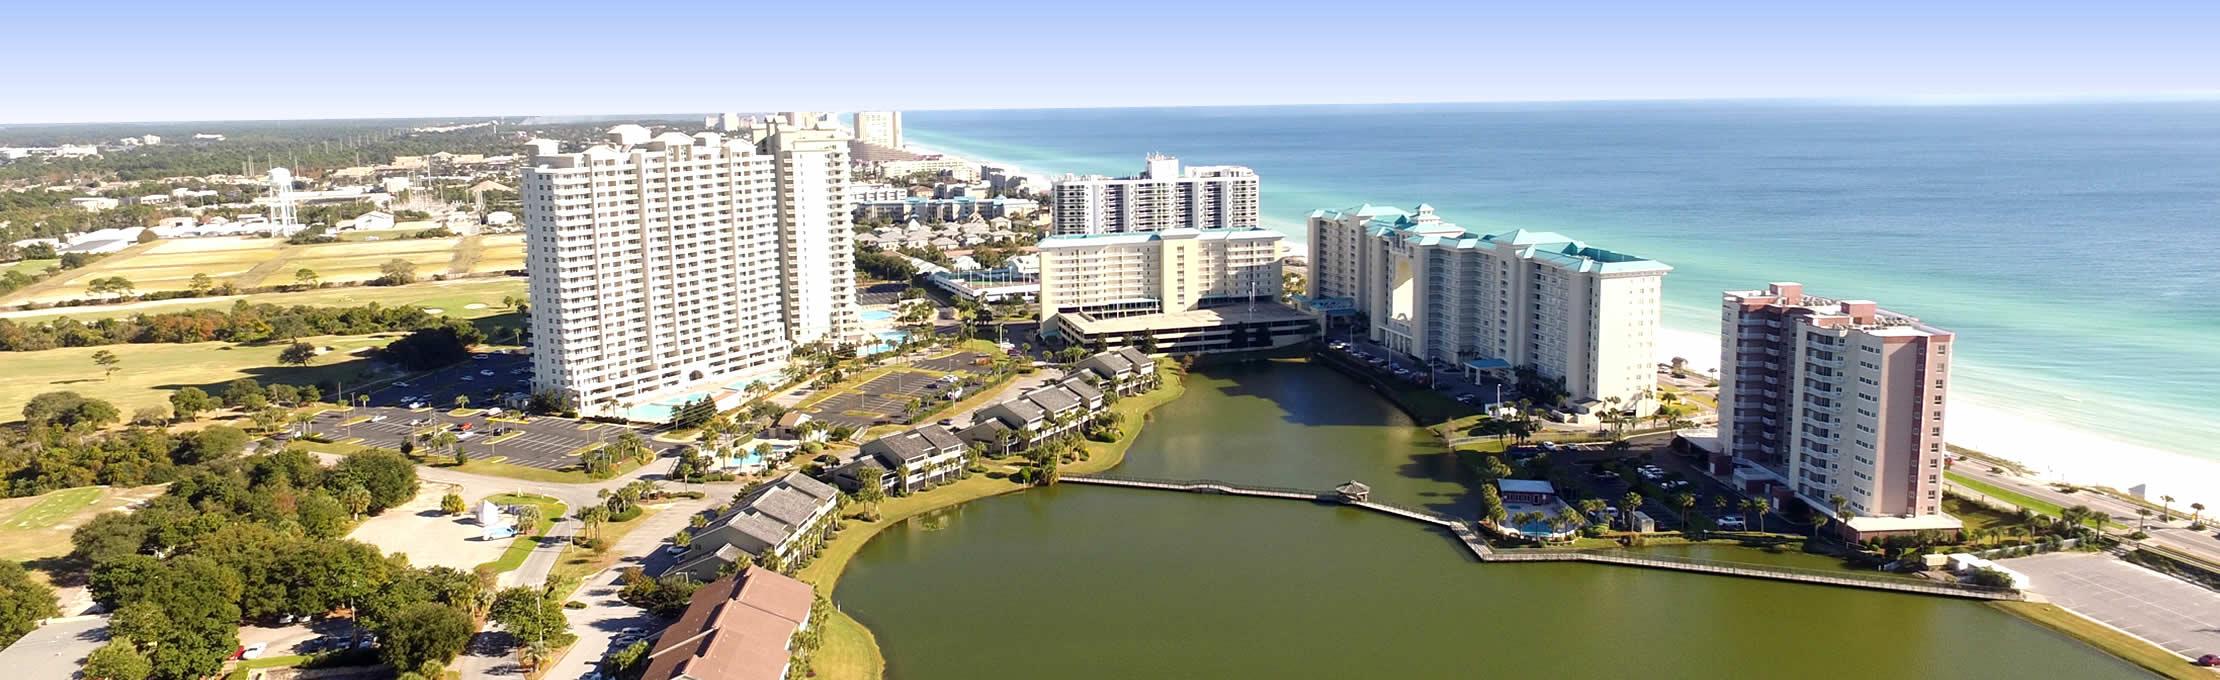 Destin Florida Condo Rentals - Seascape Resort - Seascape Resort Destin Florida Map